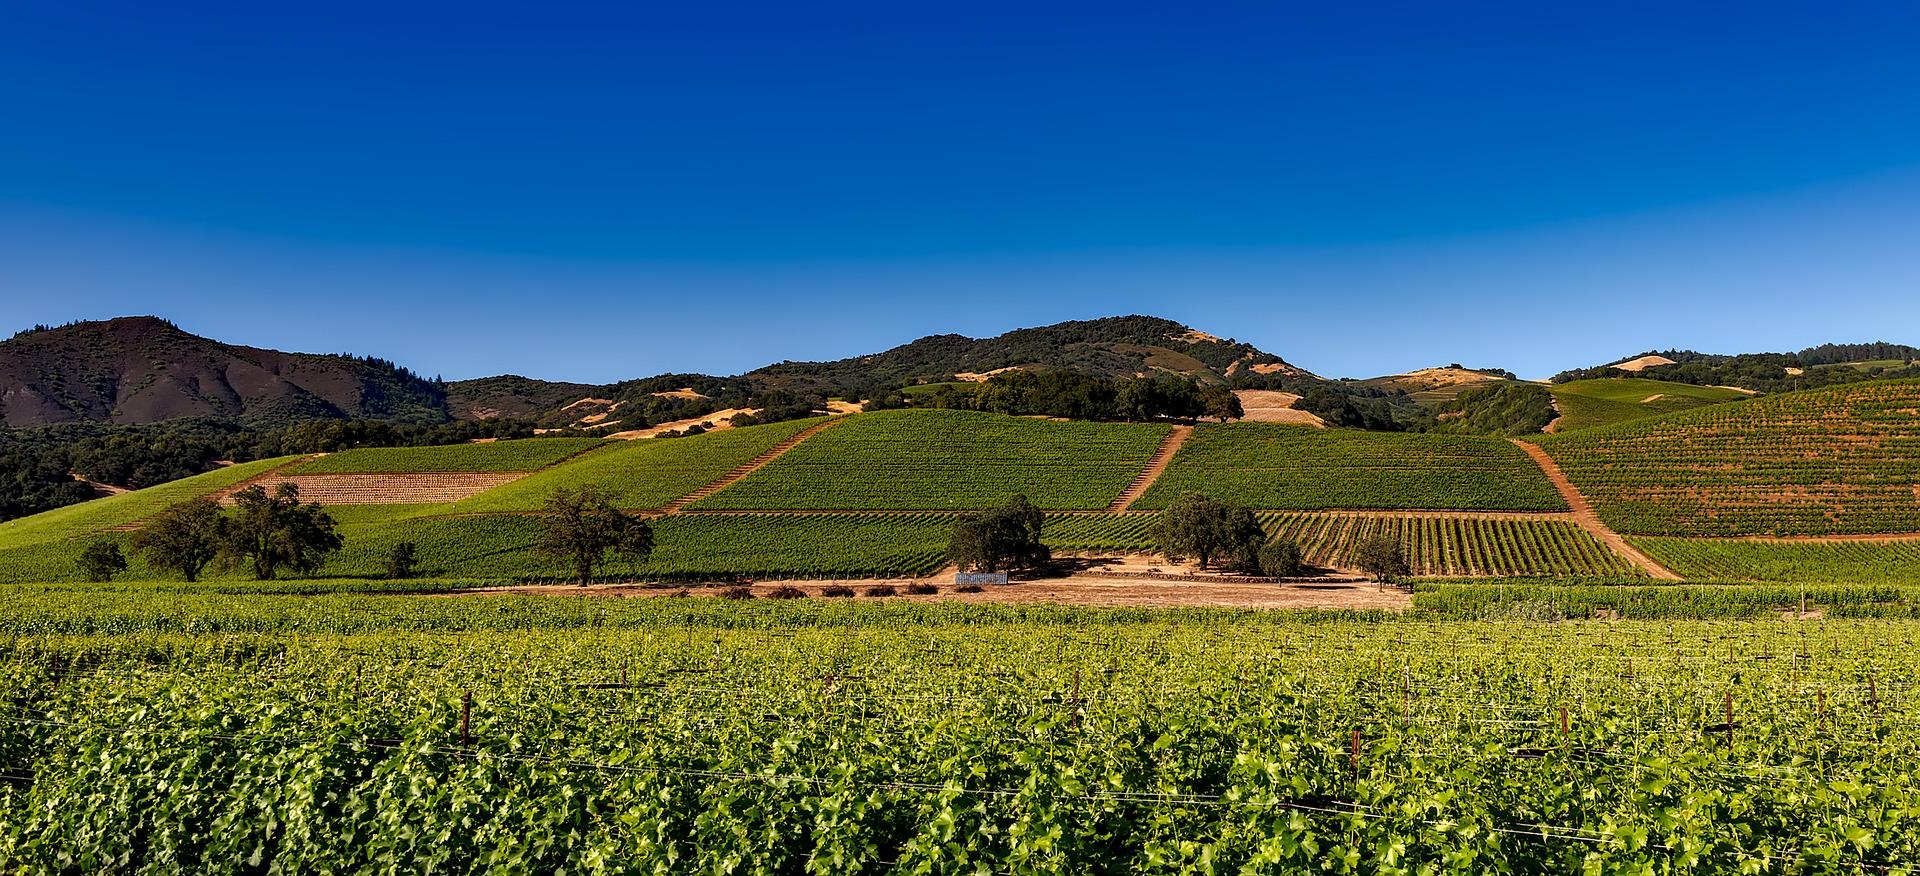 Vineyards 1590014 1920